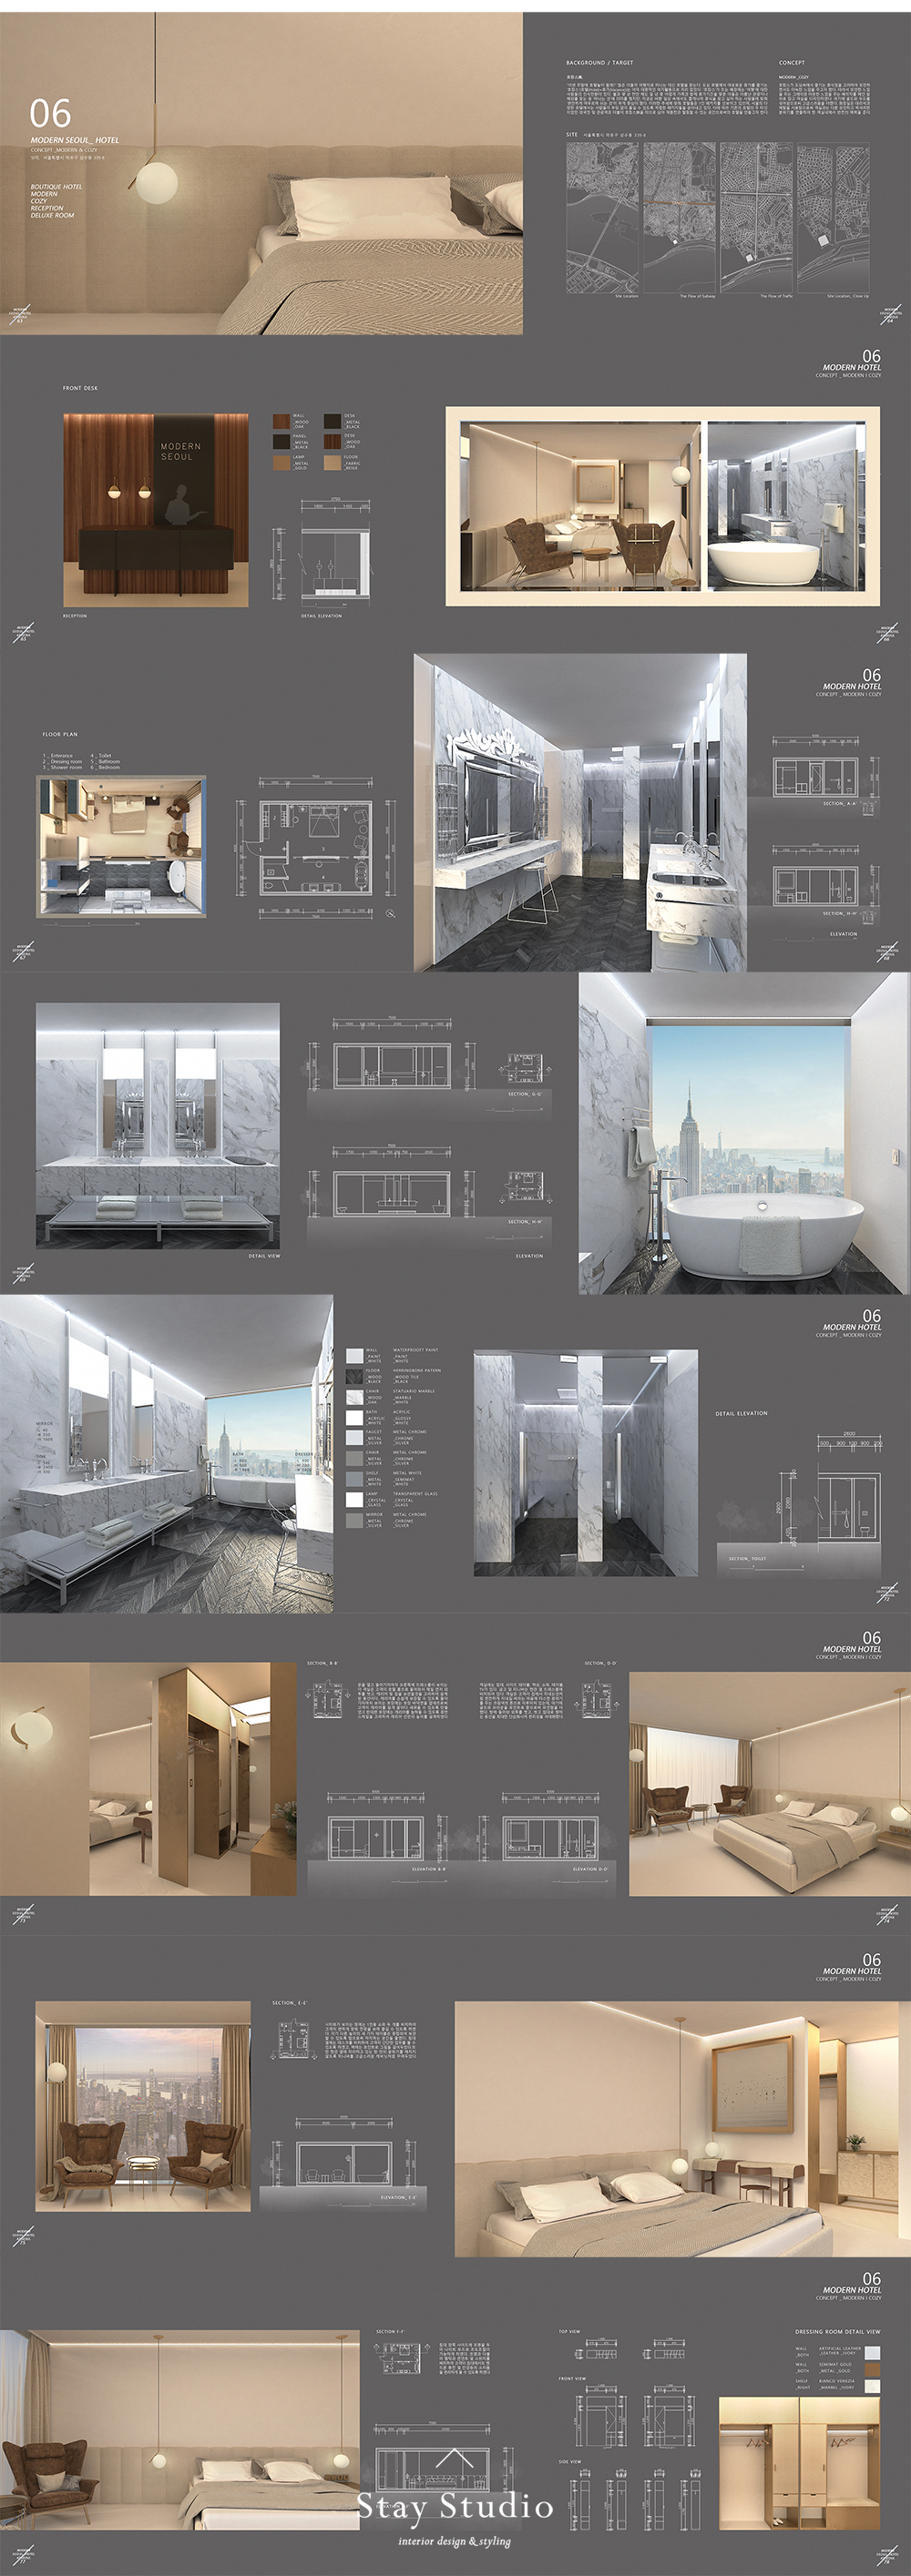 Stay Studio Interior Design Portfolio 인테리어 디자인